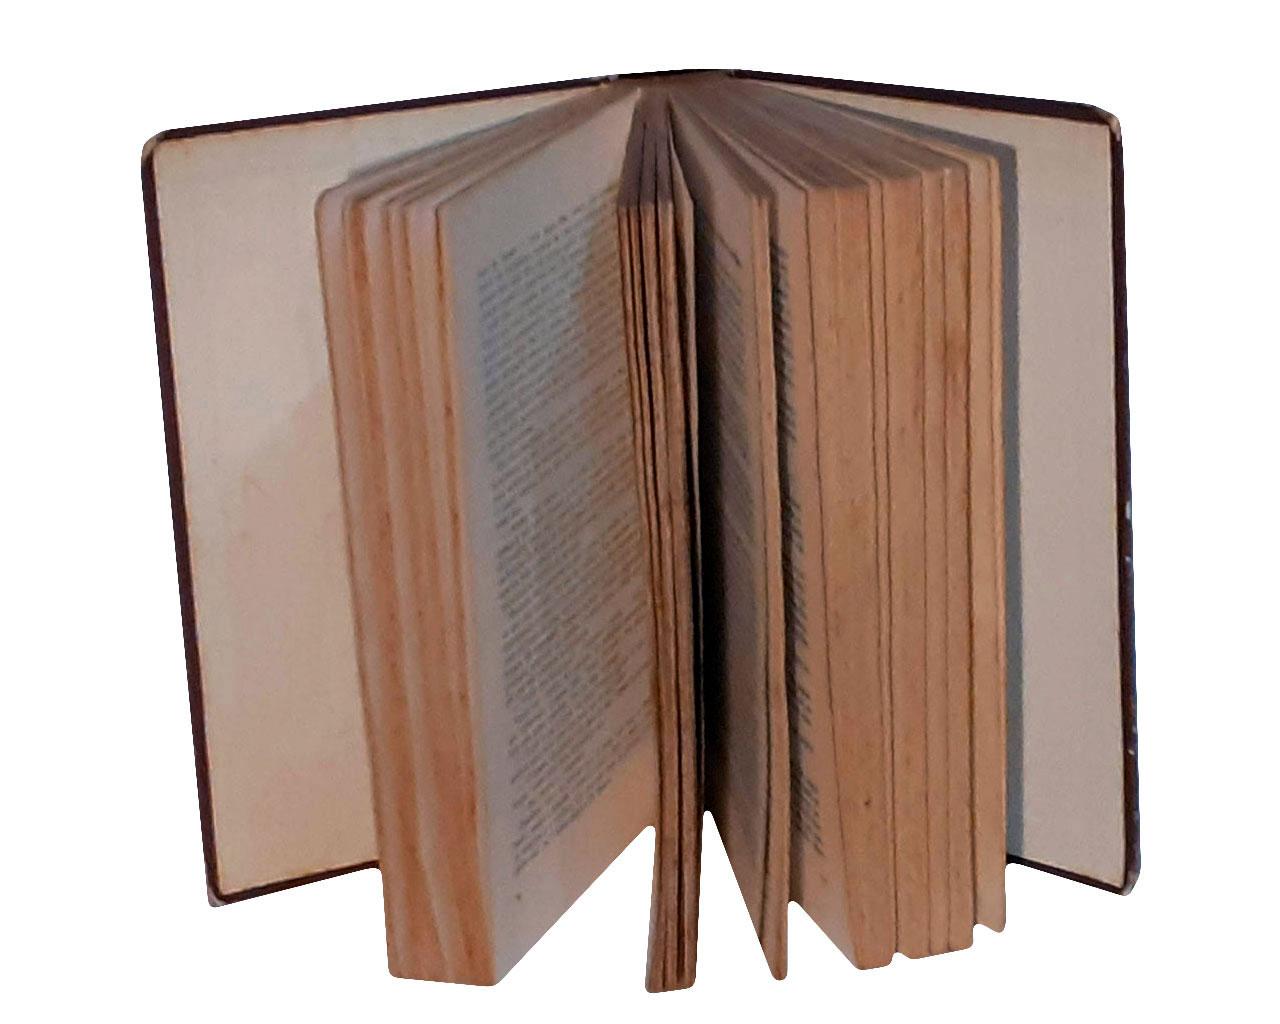 Livro: Papillon, de Henri Charriére - Capa Dura - Sem grifos